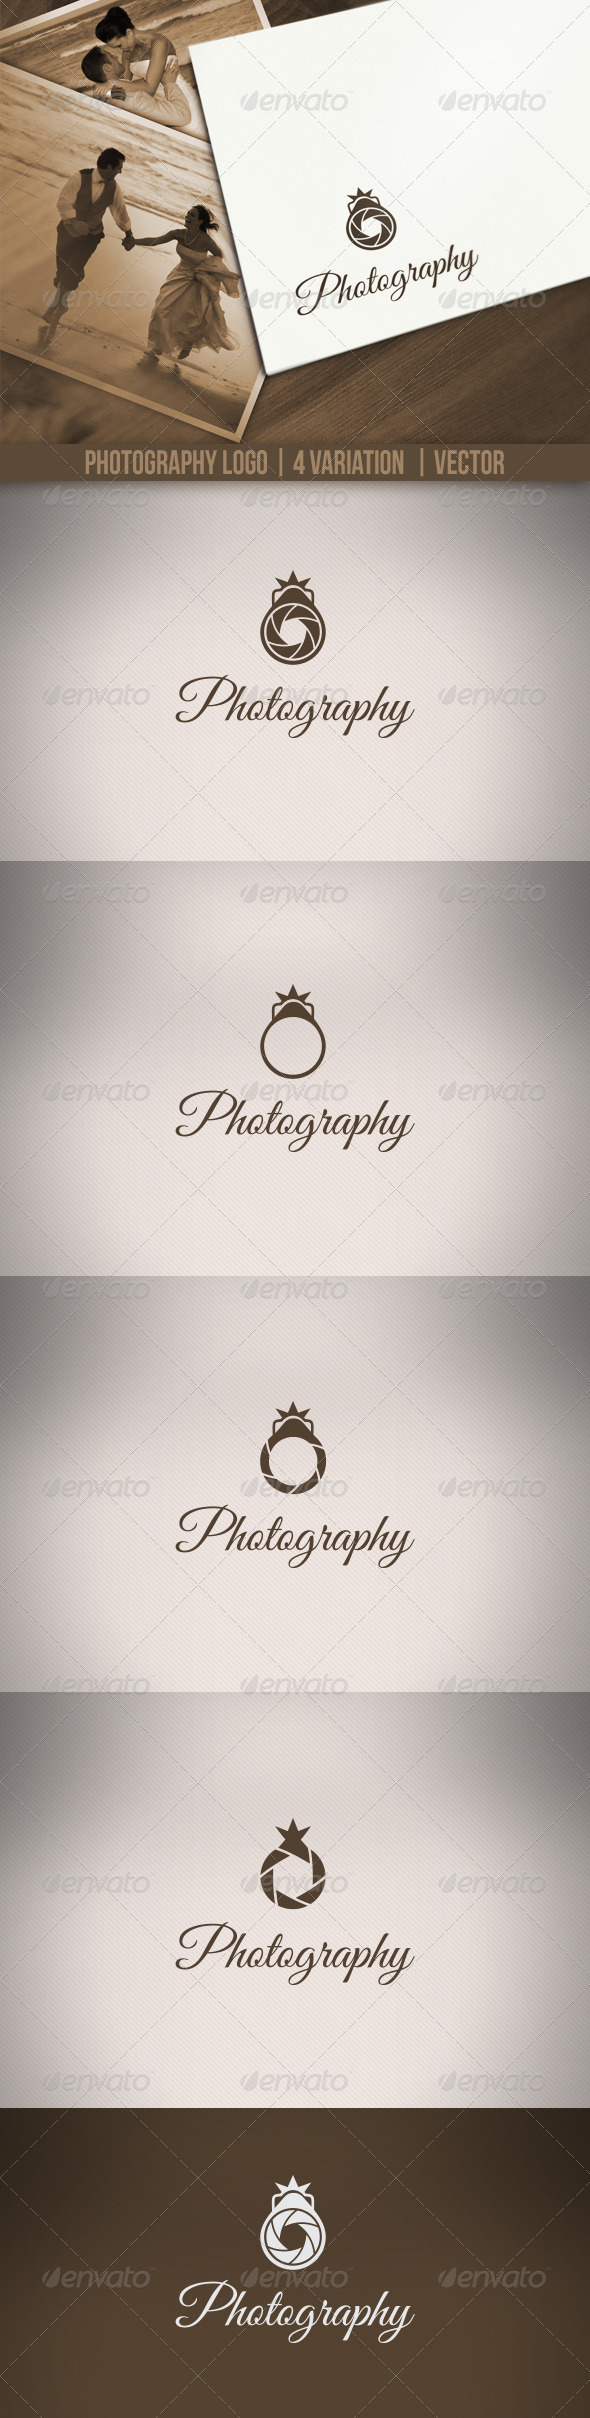 GraphicRiver Photography Logos 3445627